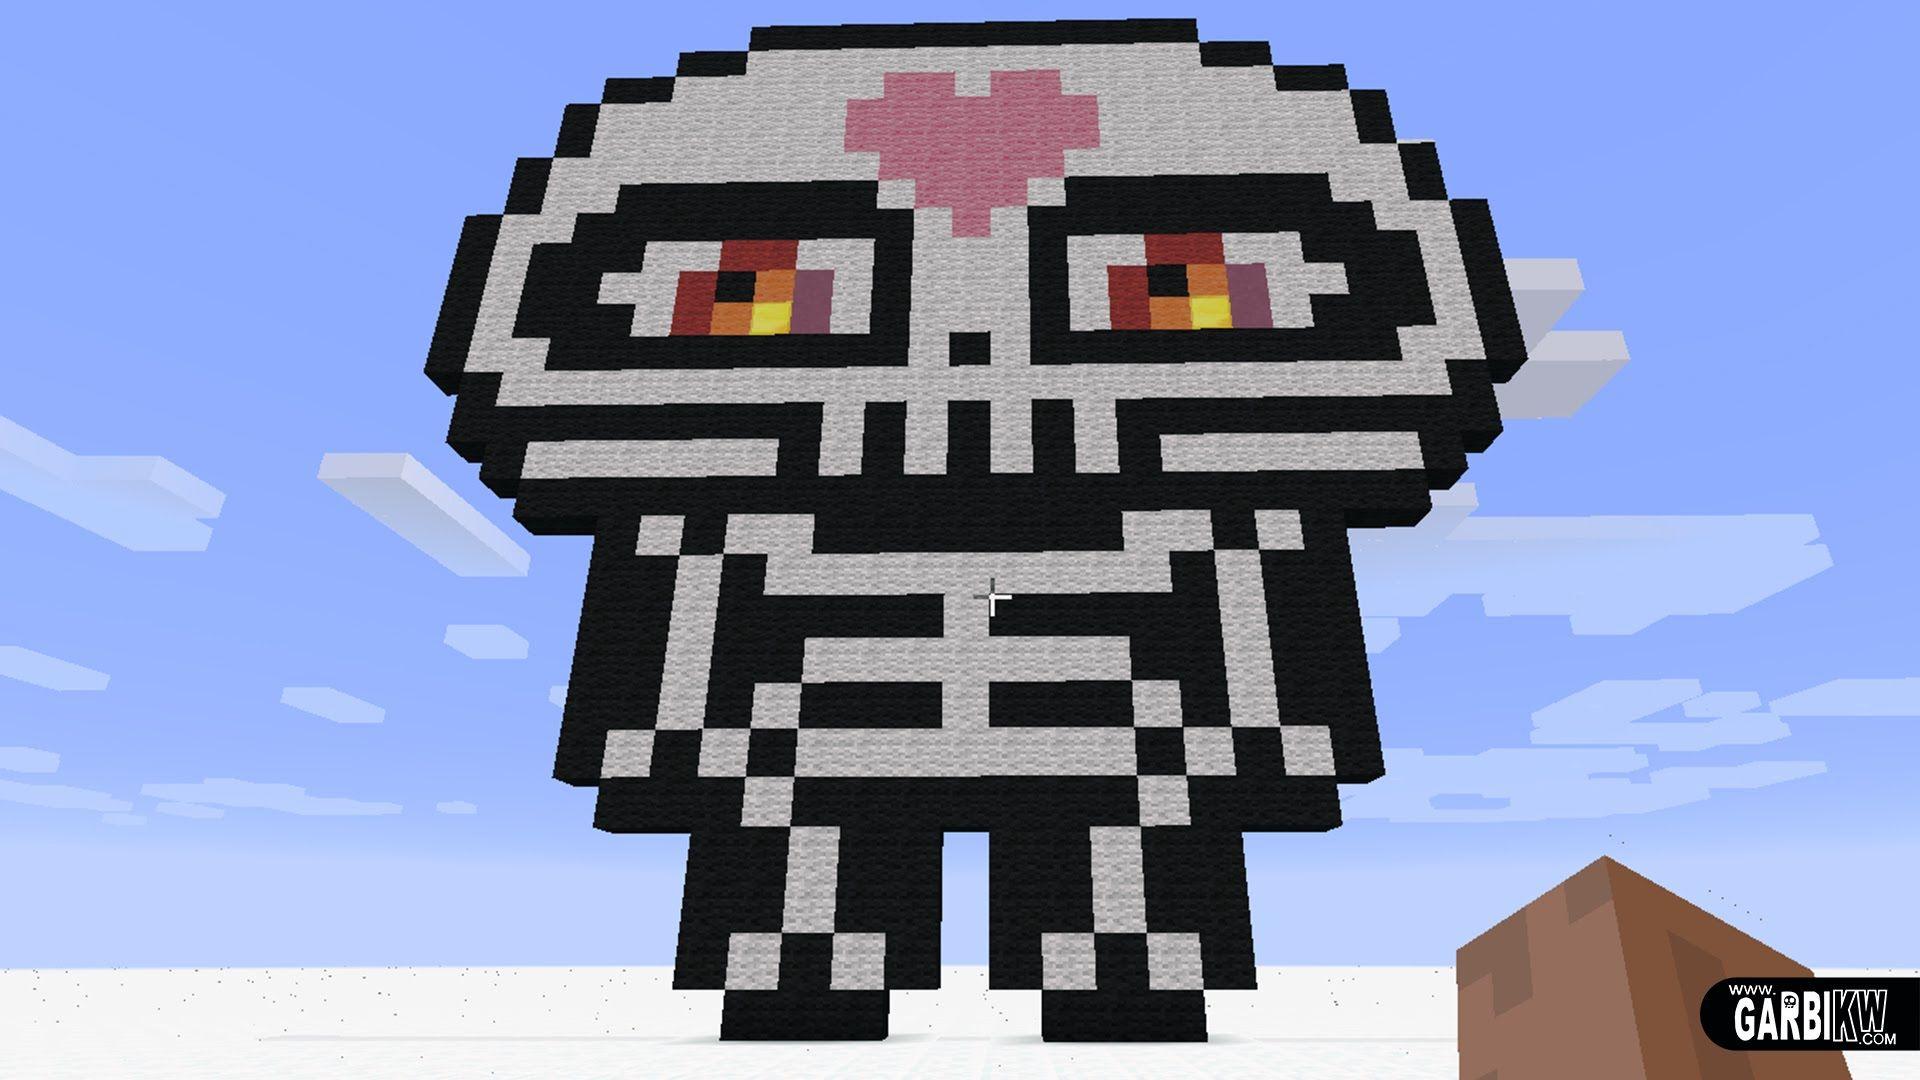 Minecraft Pixel Art - How To Make a Cute Skeleton by Garbi ...  Minecraft Cute Skeleton